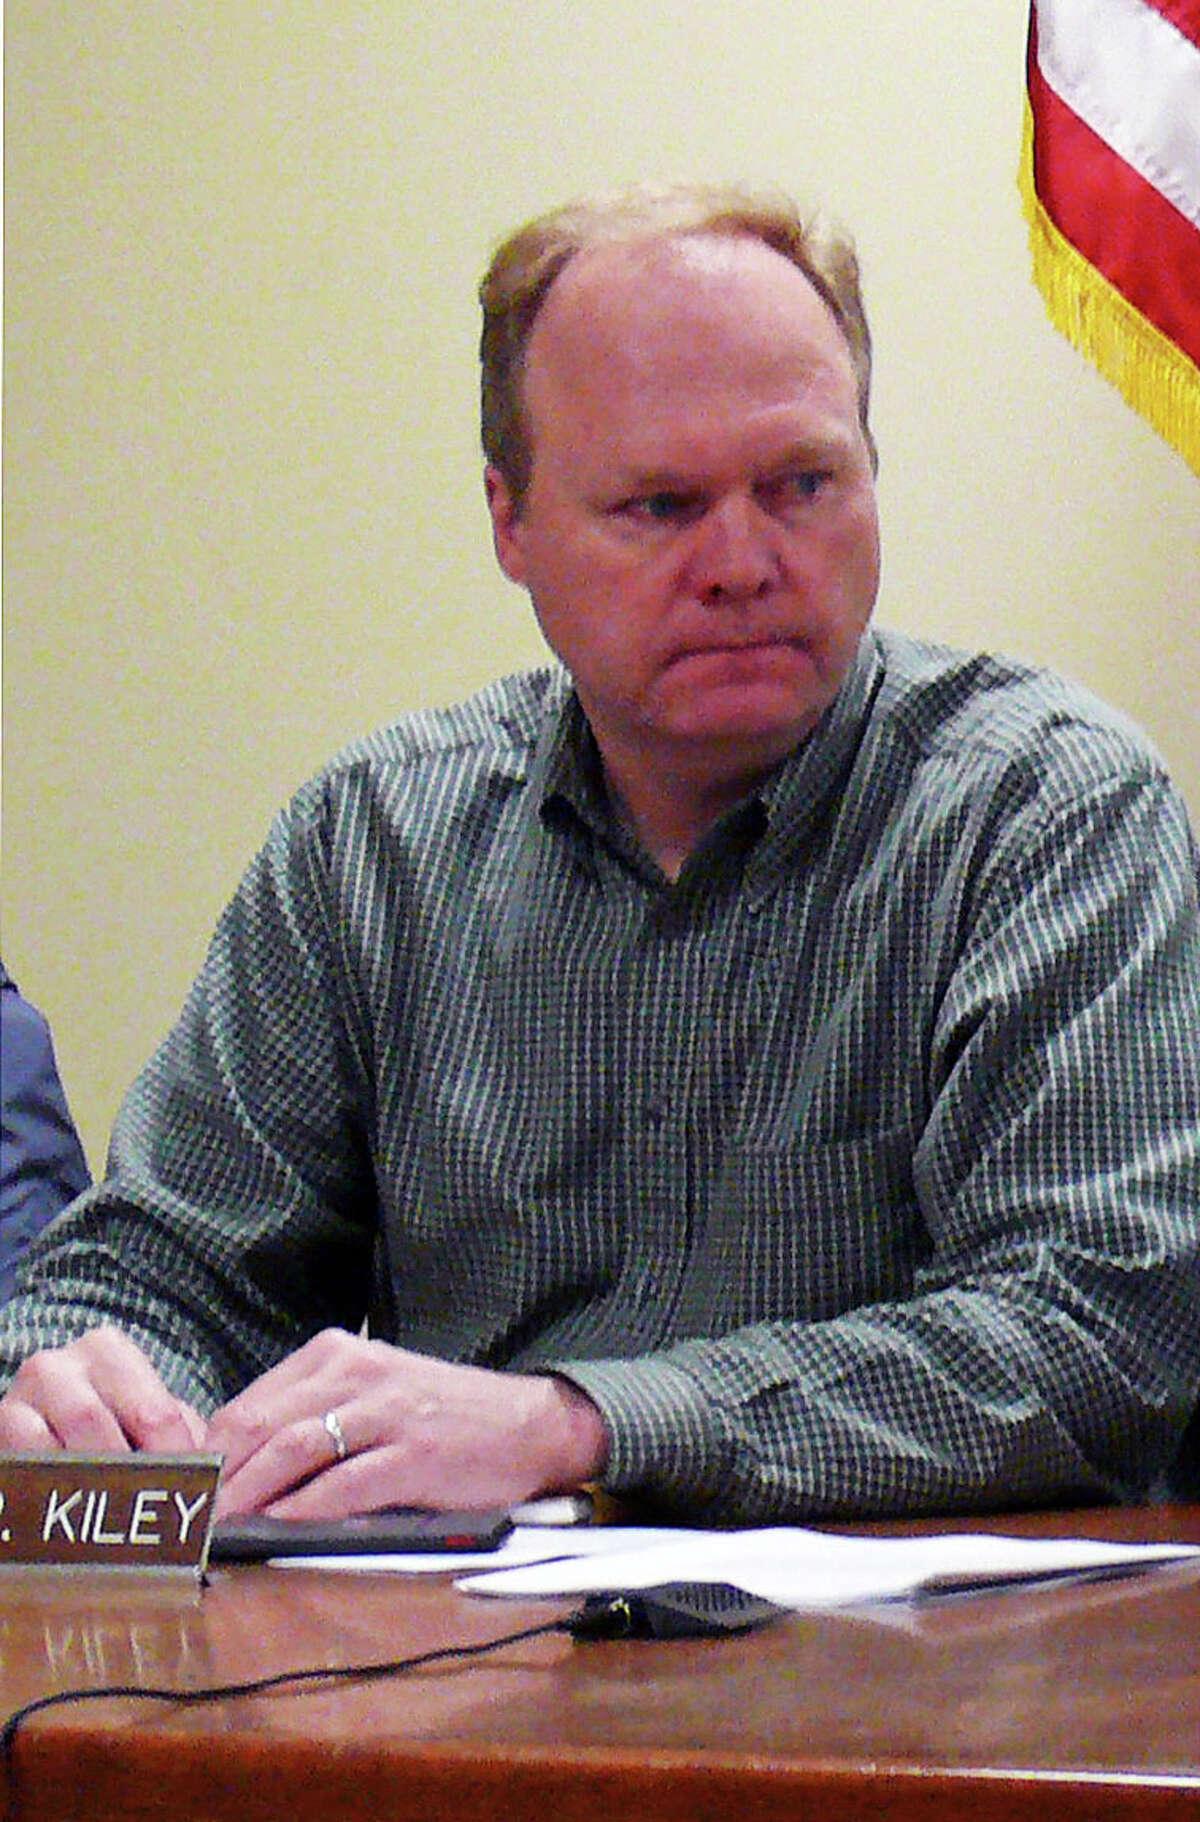 Board of Finance member Kevin Kiley is interested in taking James Walsh's seat on the Board of Selectmen.